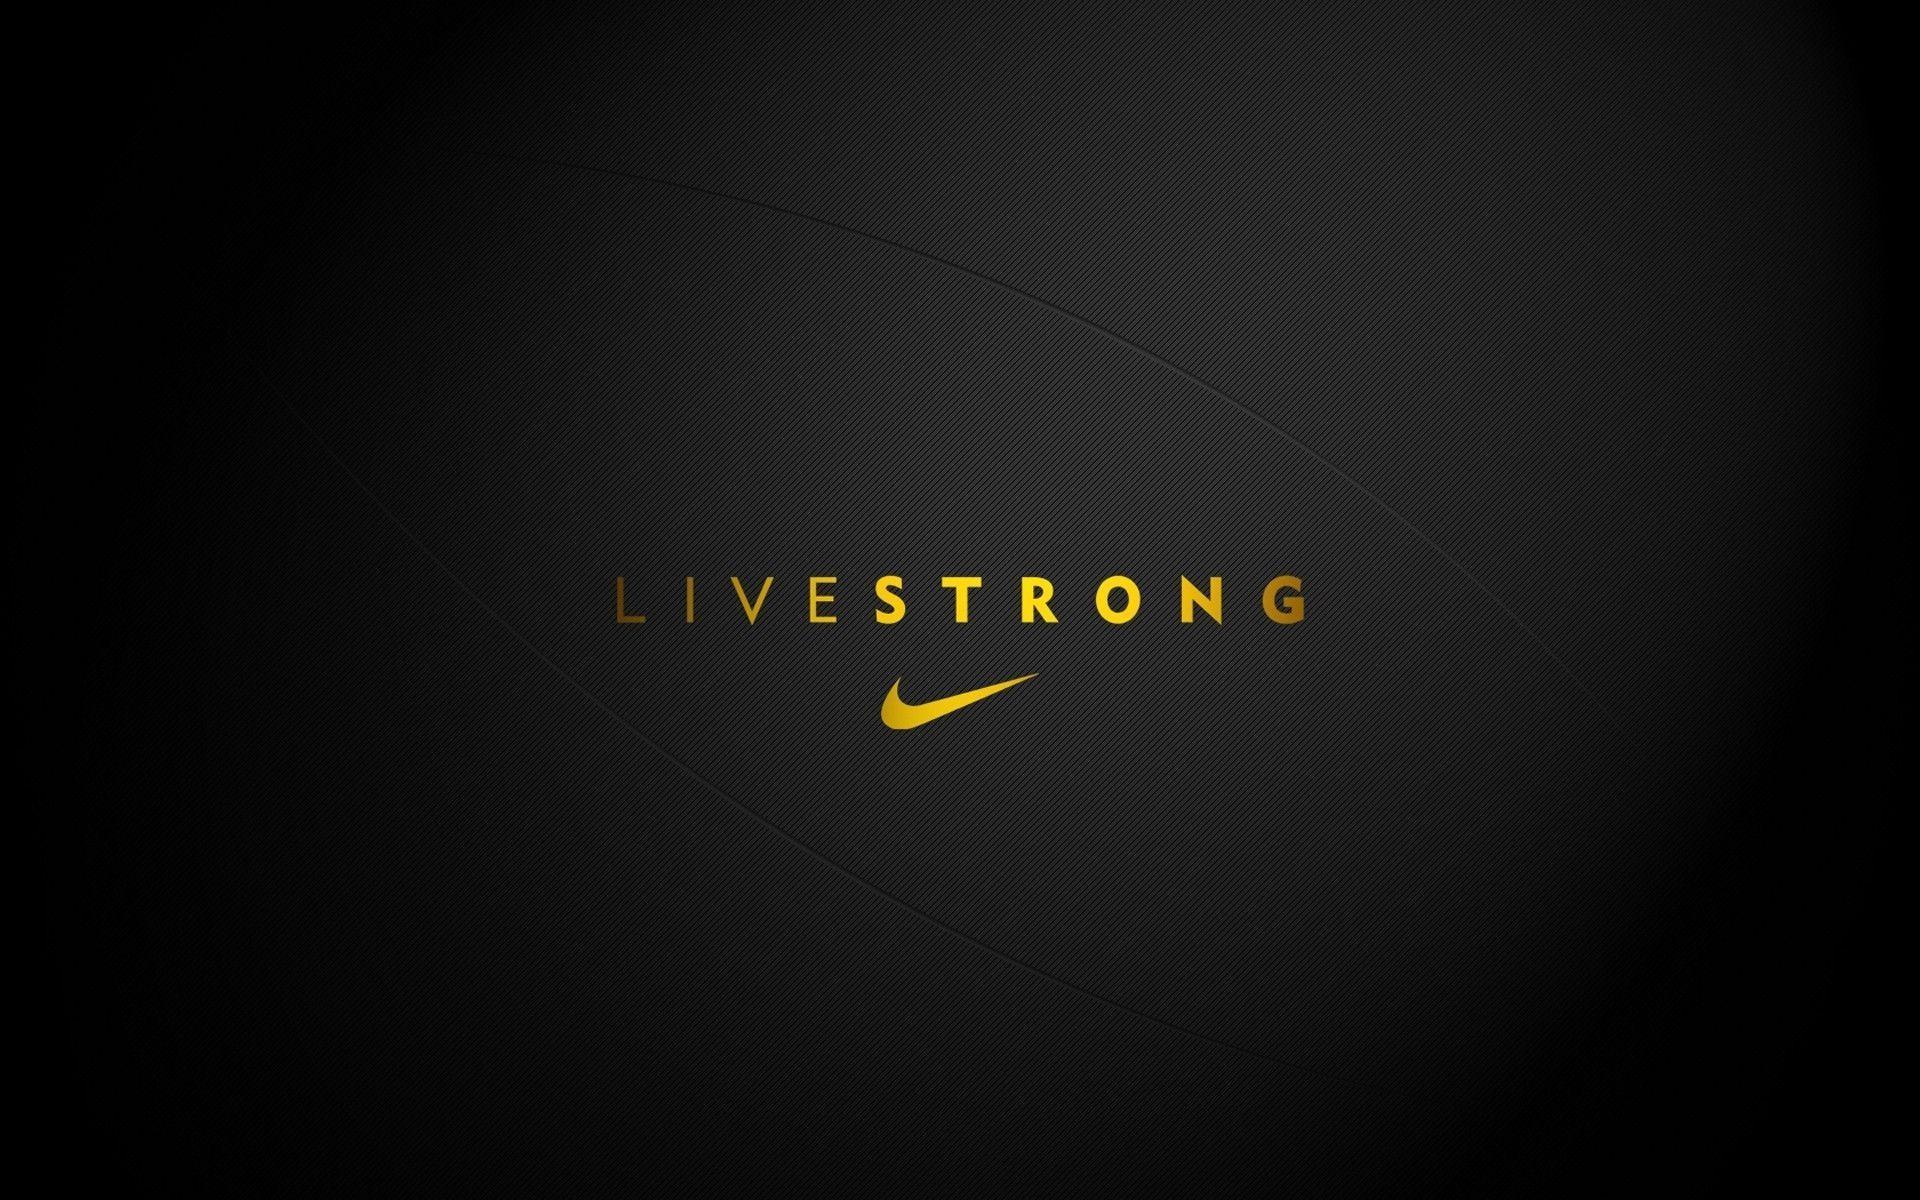 Nike Wallpapers Wallpaper Cave